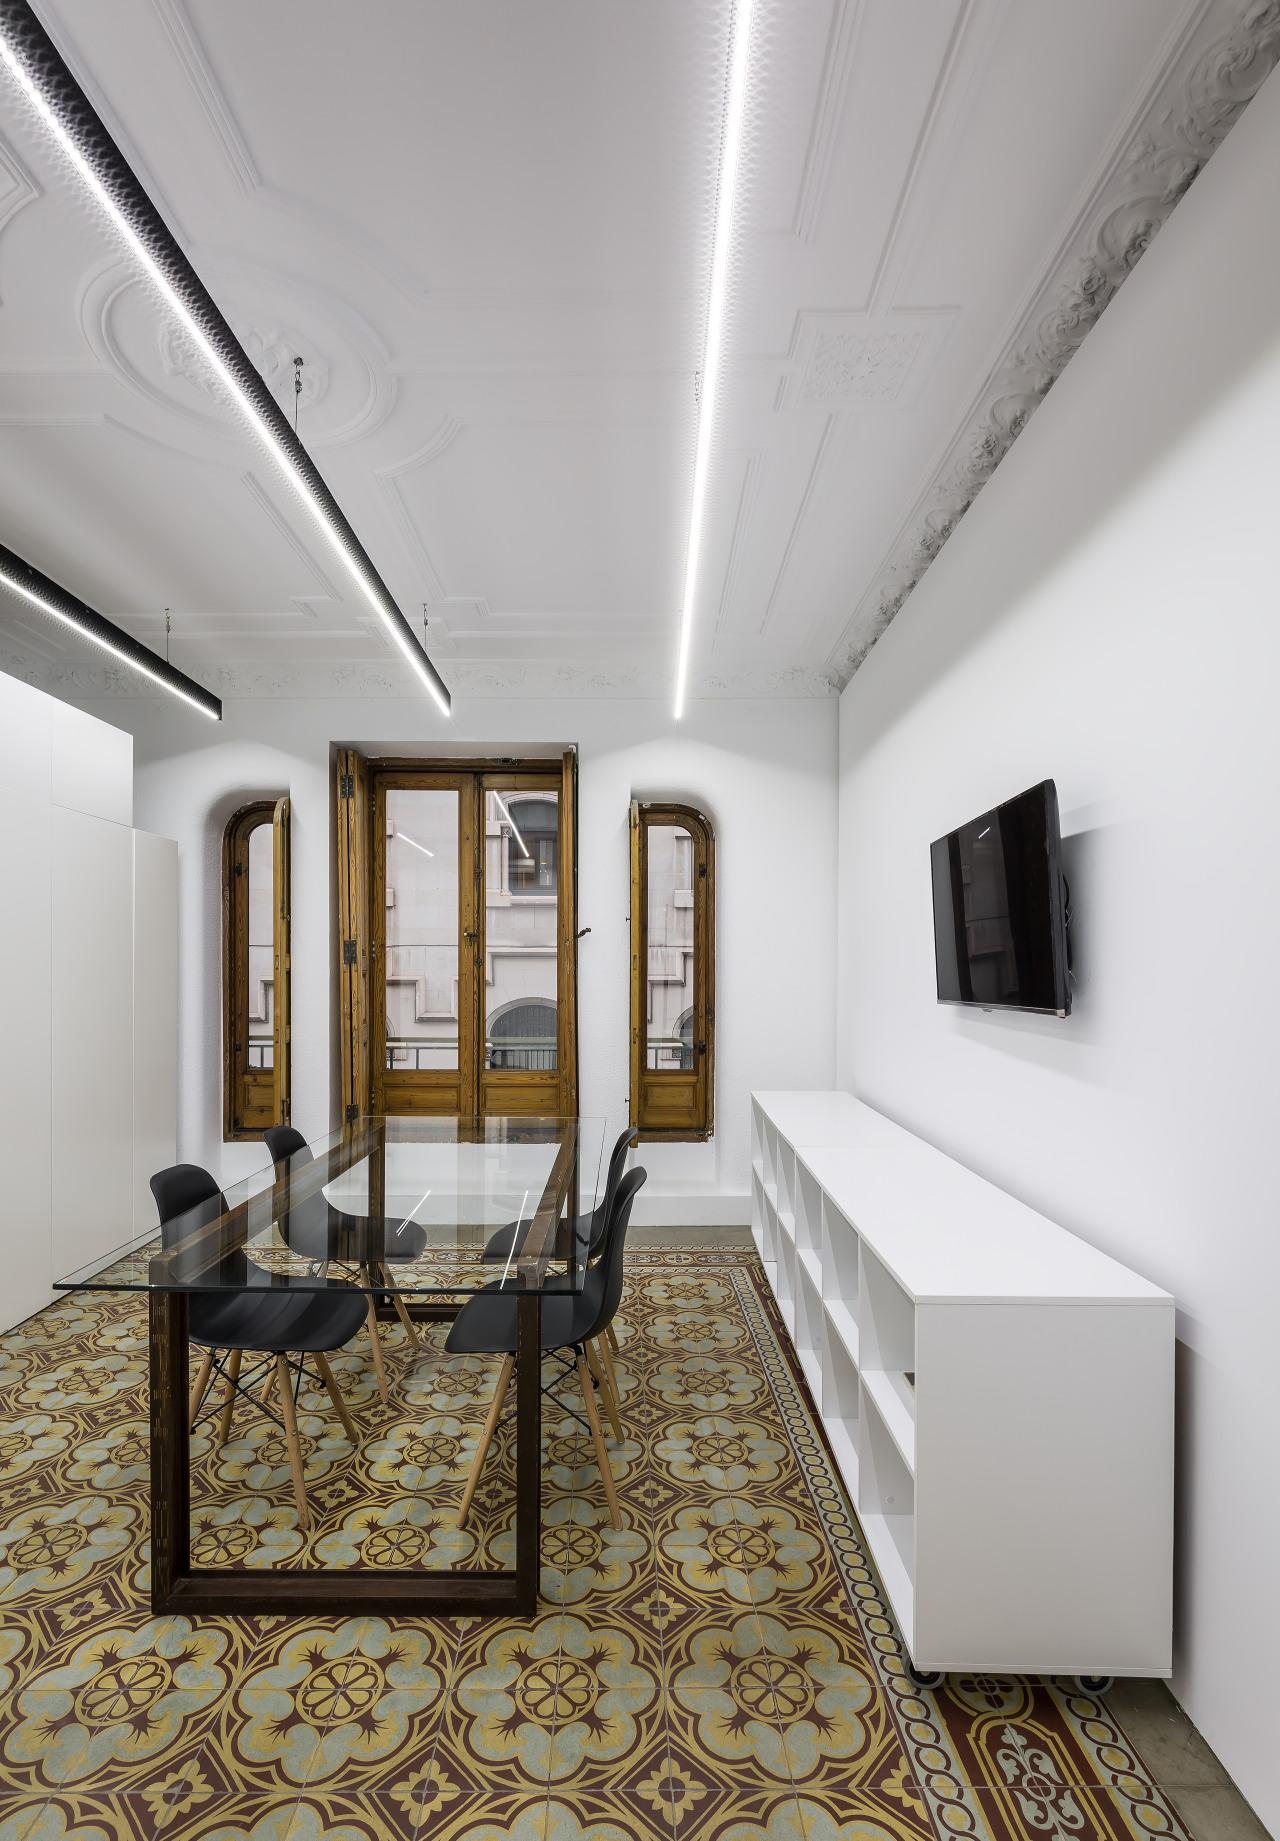 fotografia-arquitectura-interiorismo-valencia-german-cabo-viraje-estudio-pujol (16)